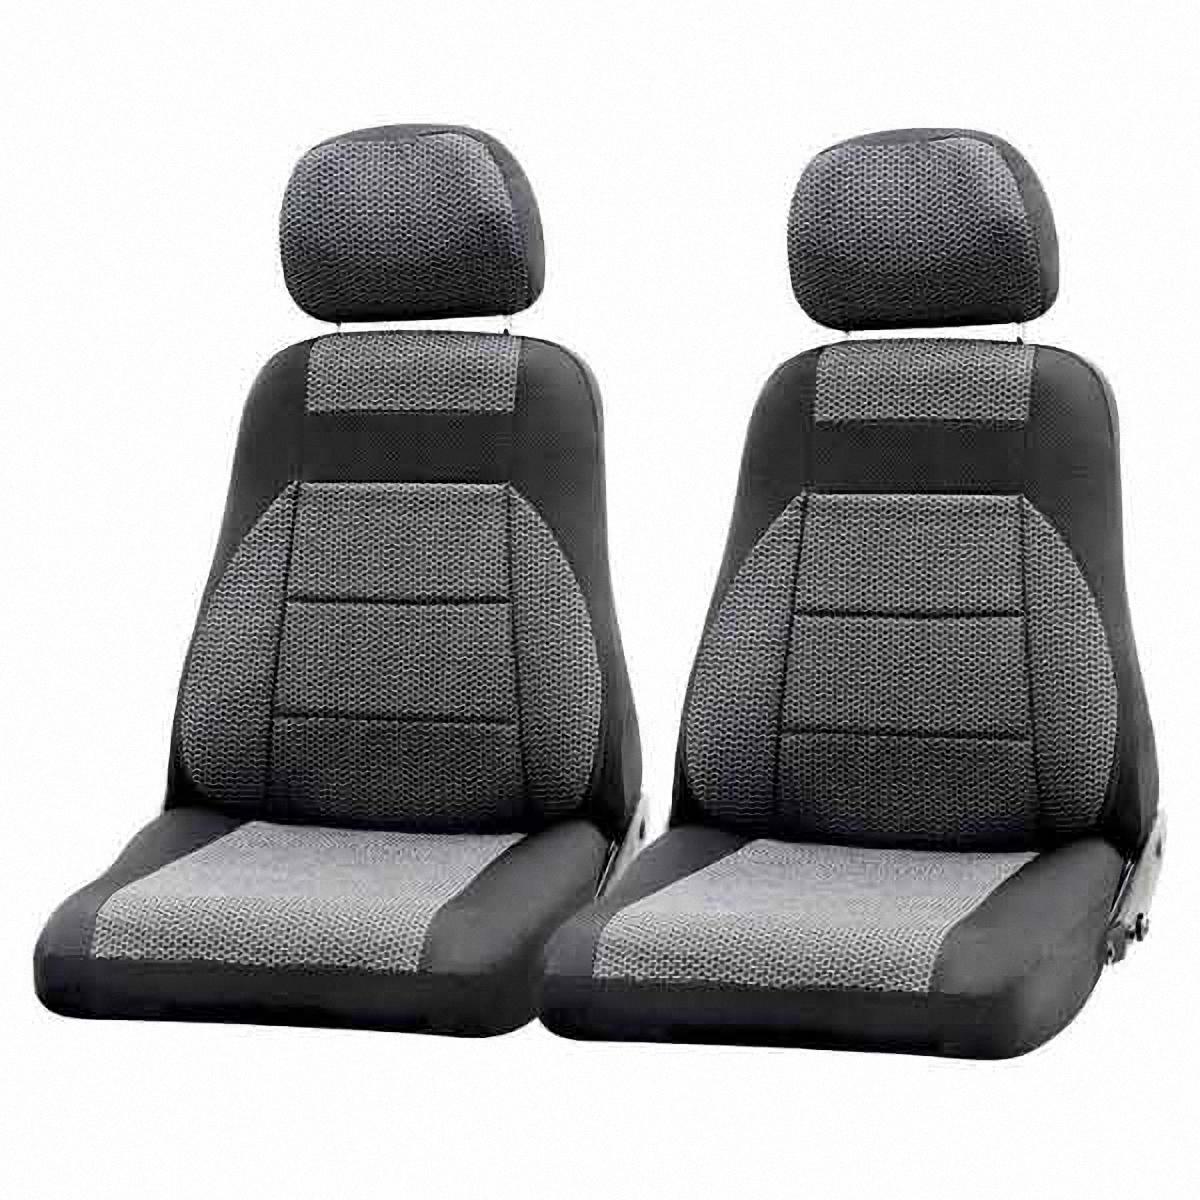 Чехол на сиденье Skyway ВАЗ-2110 (седан). V009-D2V009-D2